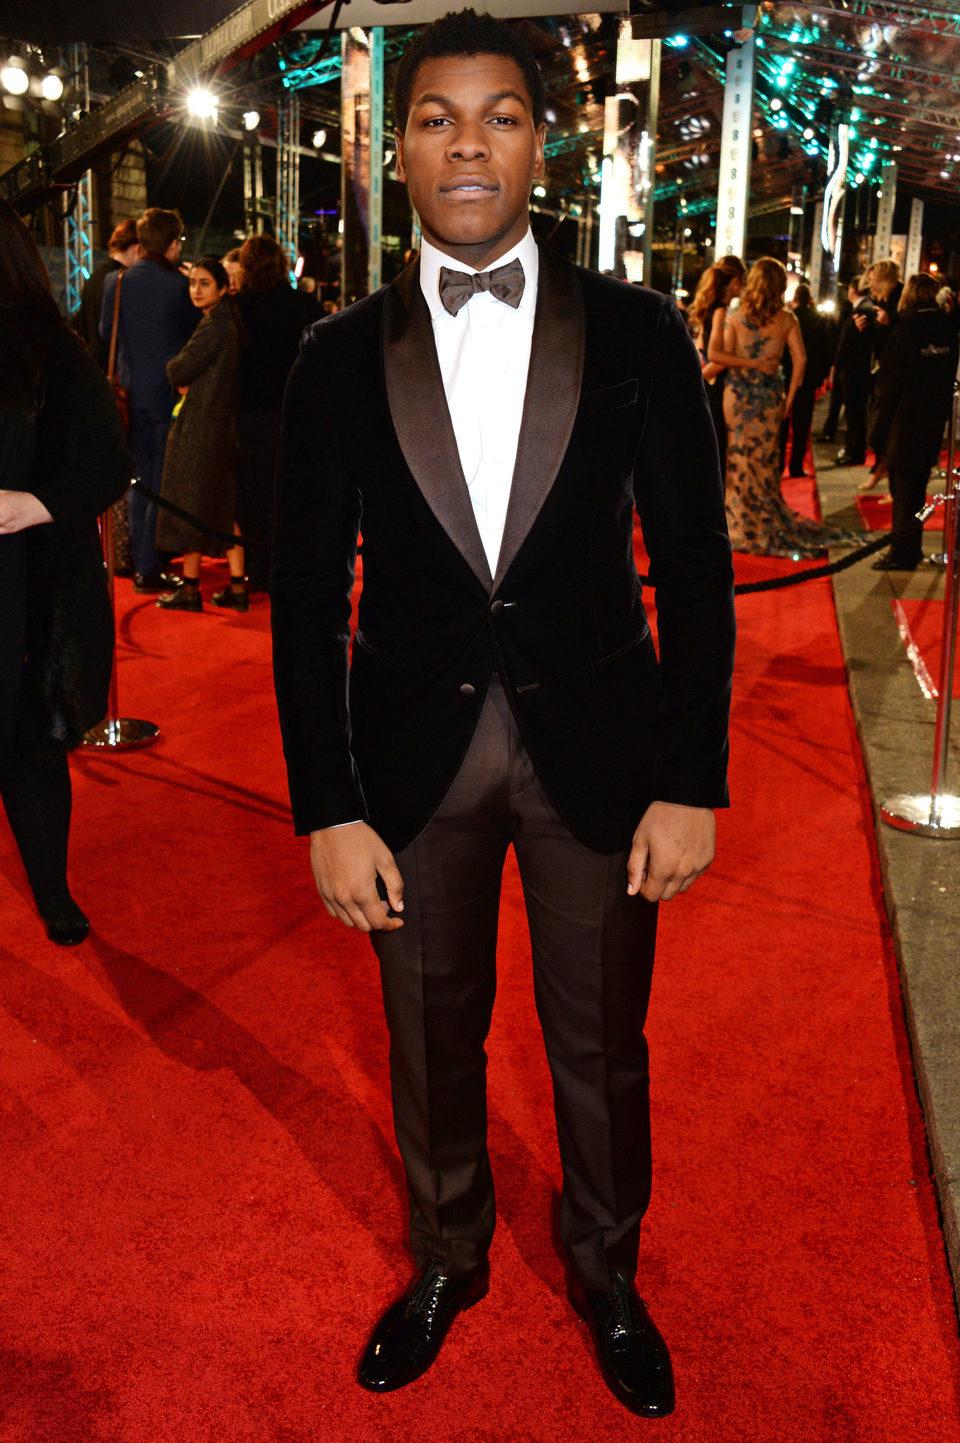 John Boyega en la alfombra roja de los BAFTA Awards 2016